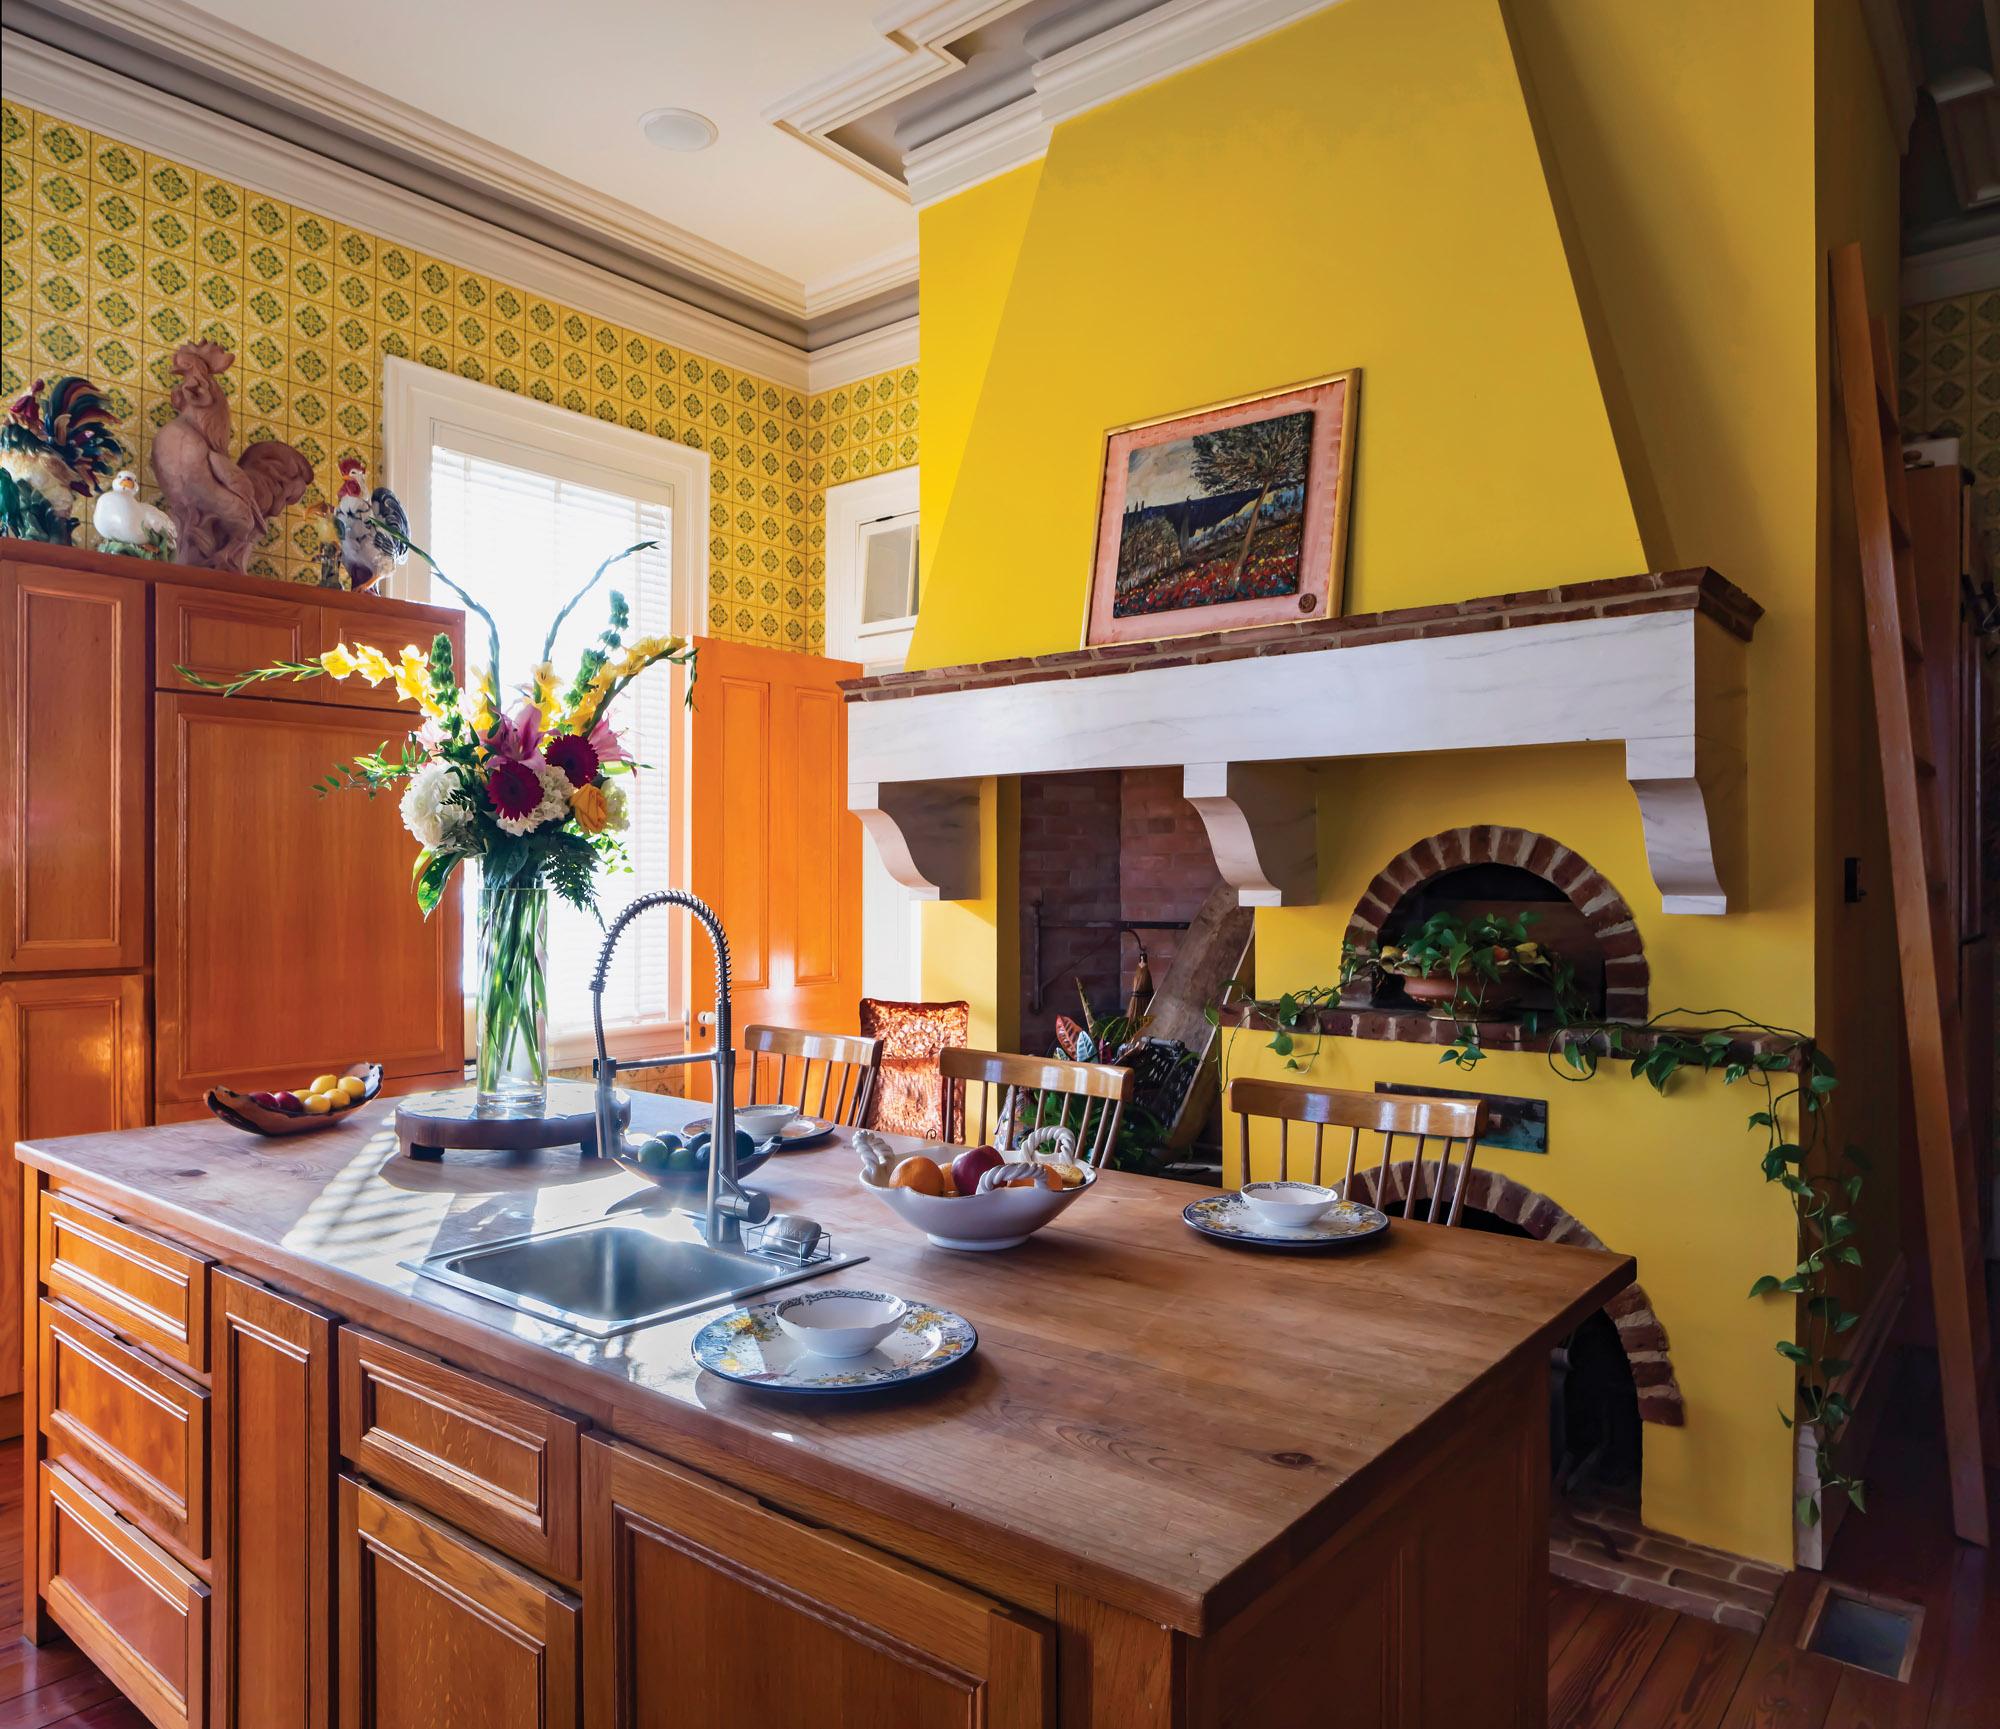 Rosedale kitchen, yellow kitchen